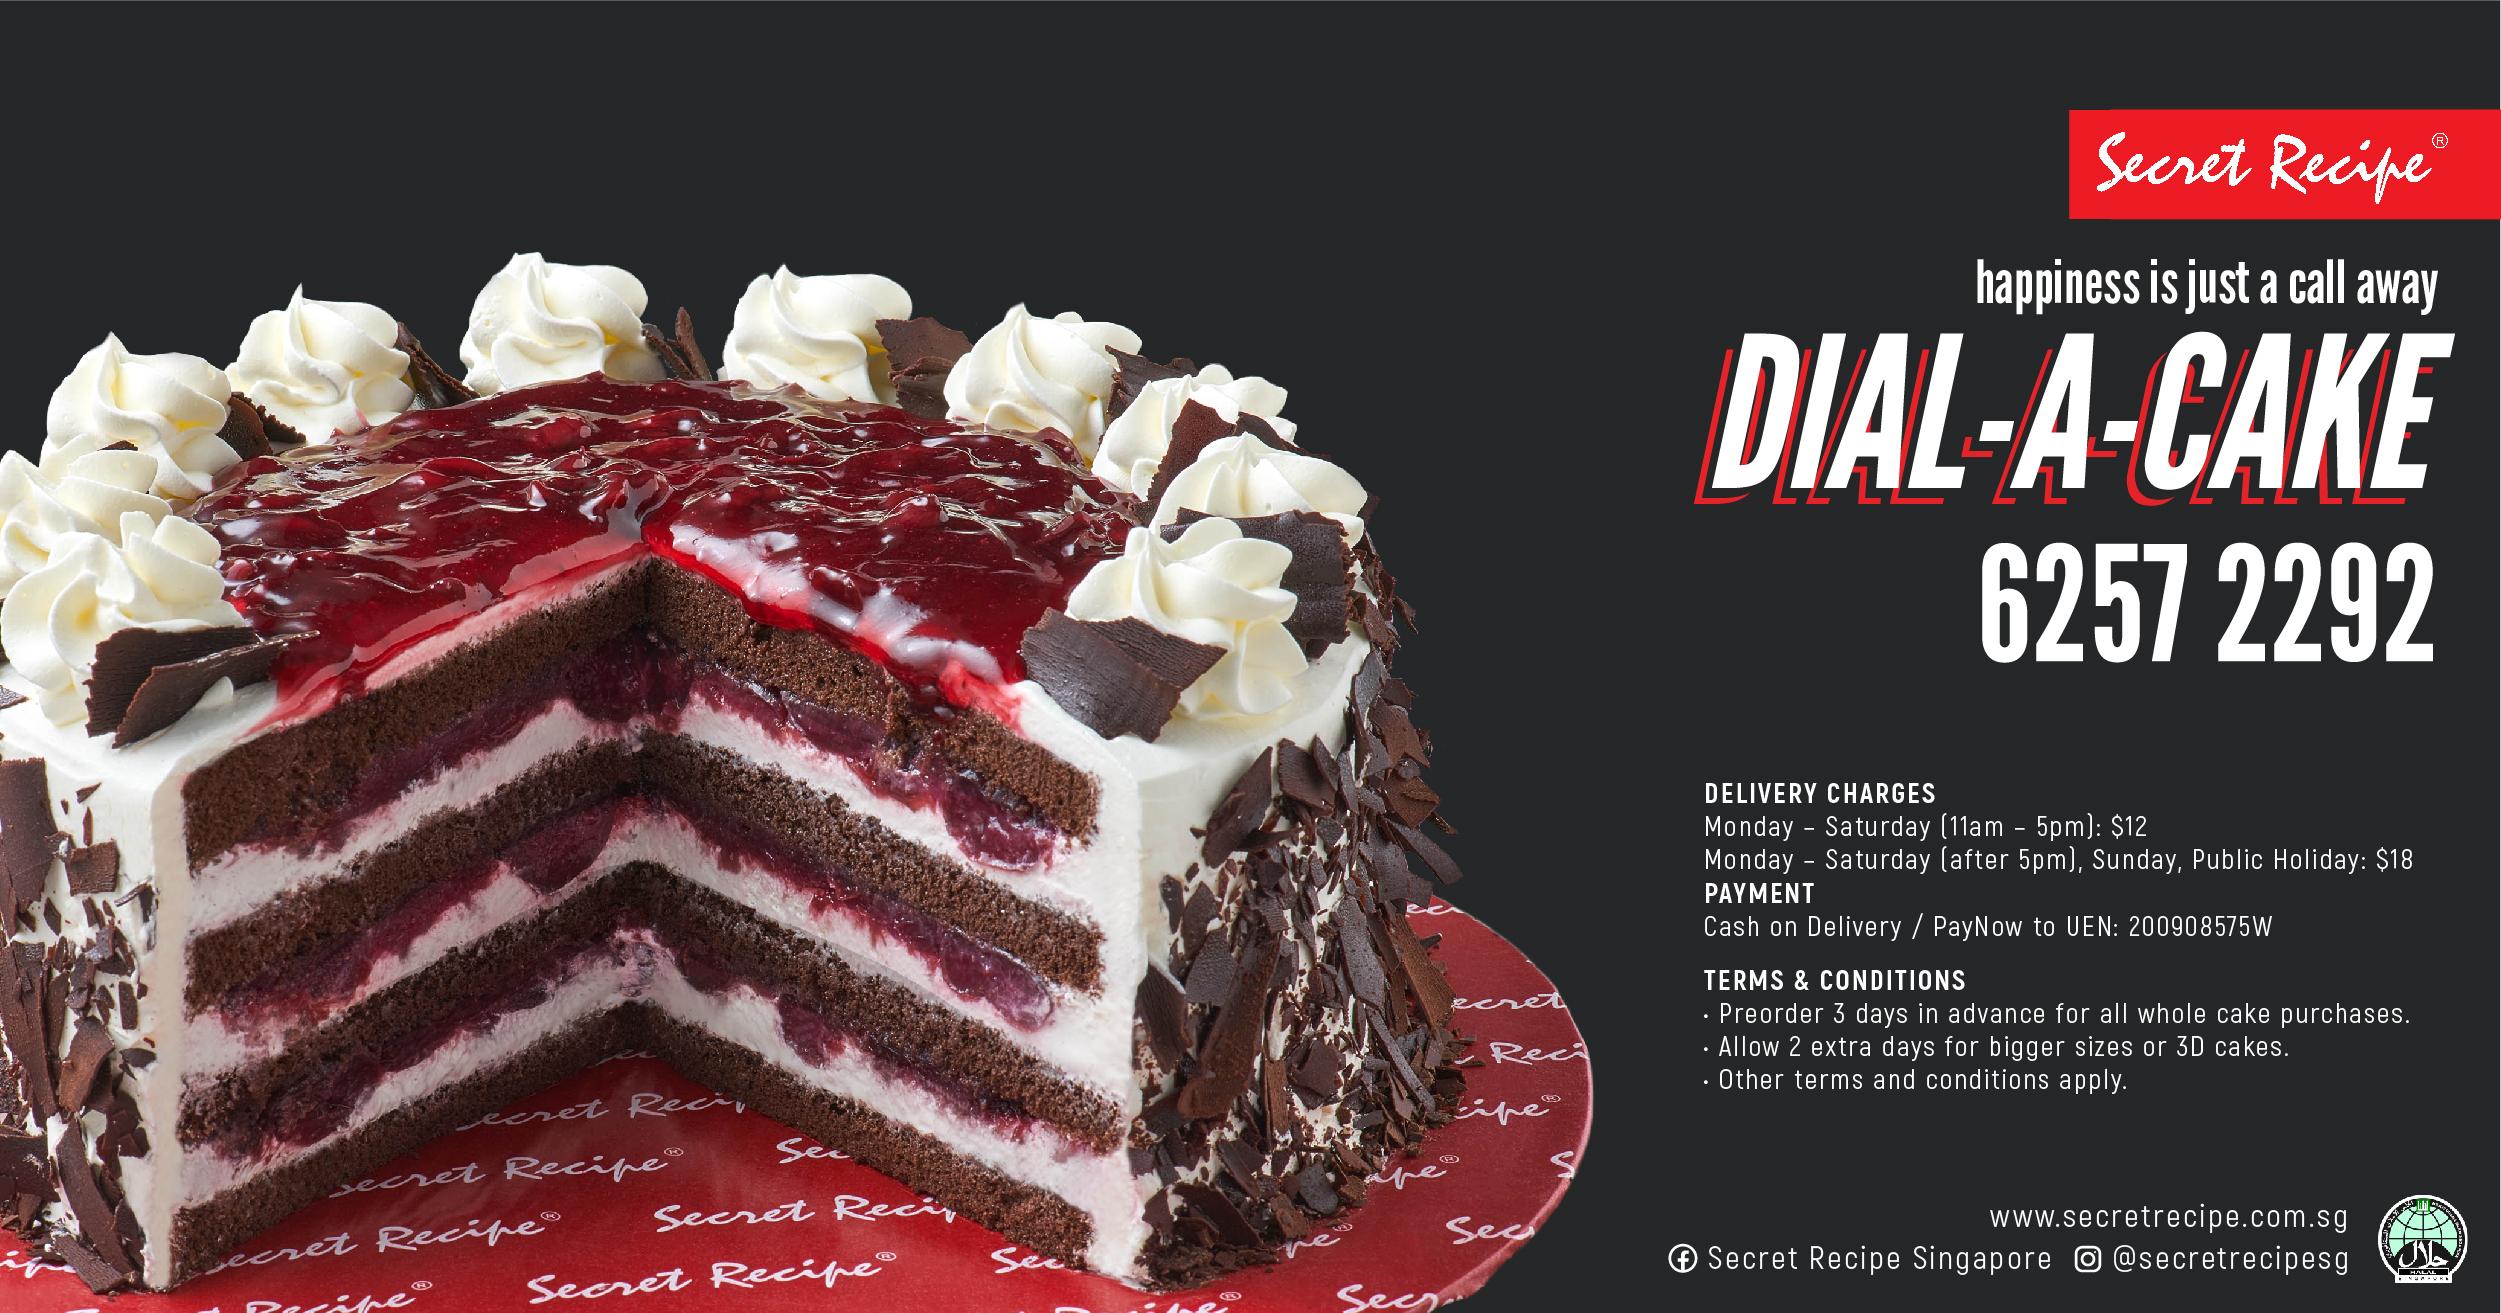 Dial-A-Cake